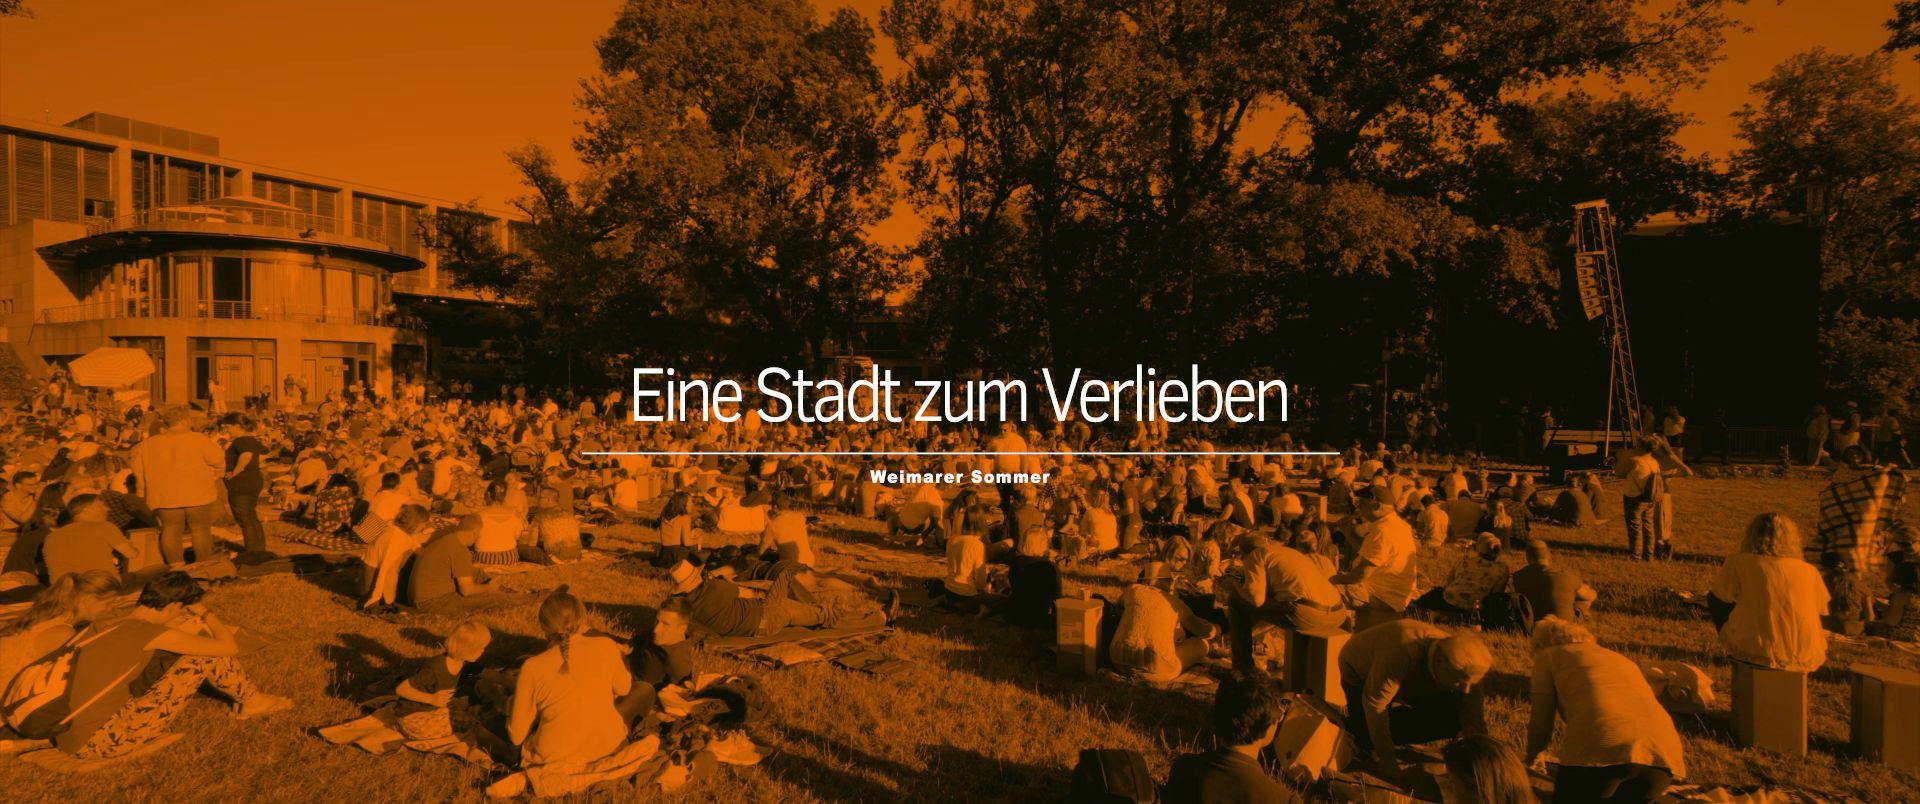 Weimarer Sommer